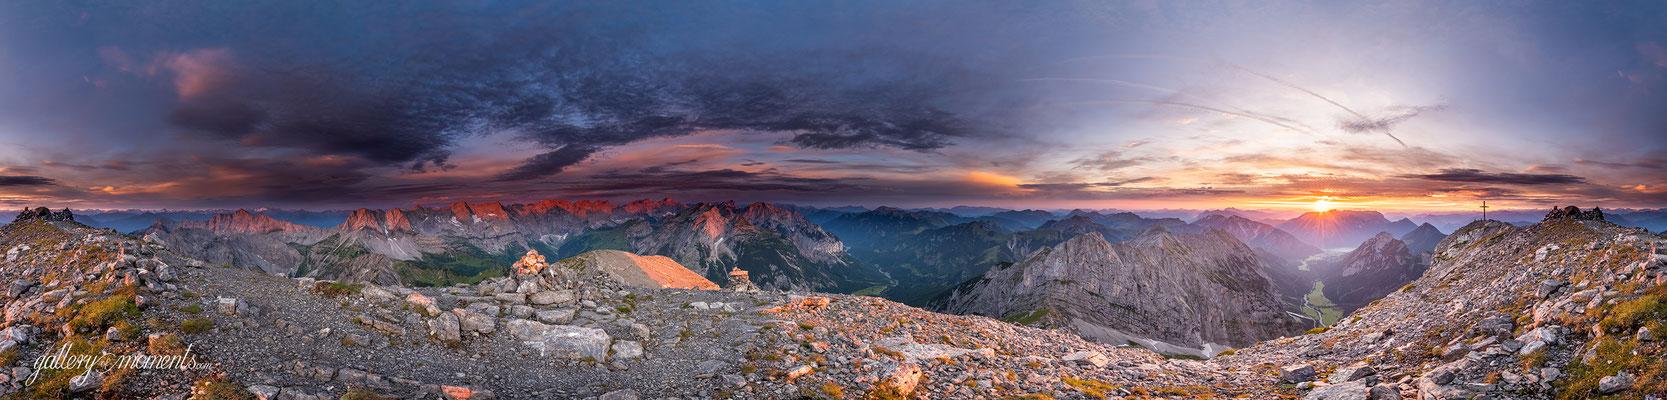 Sonnenaufgang am Sonnjoch im Karwendel / Tirol (Bildnummer 505304)